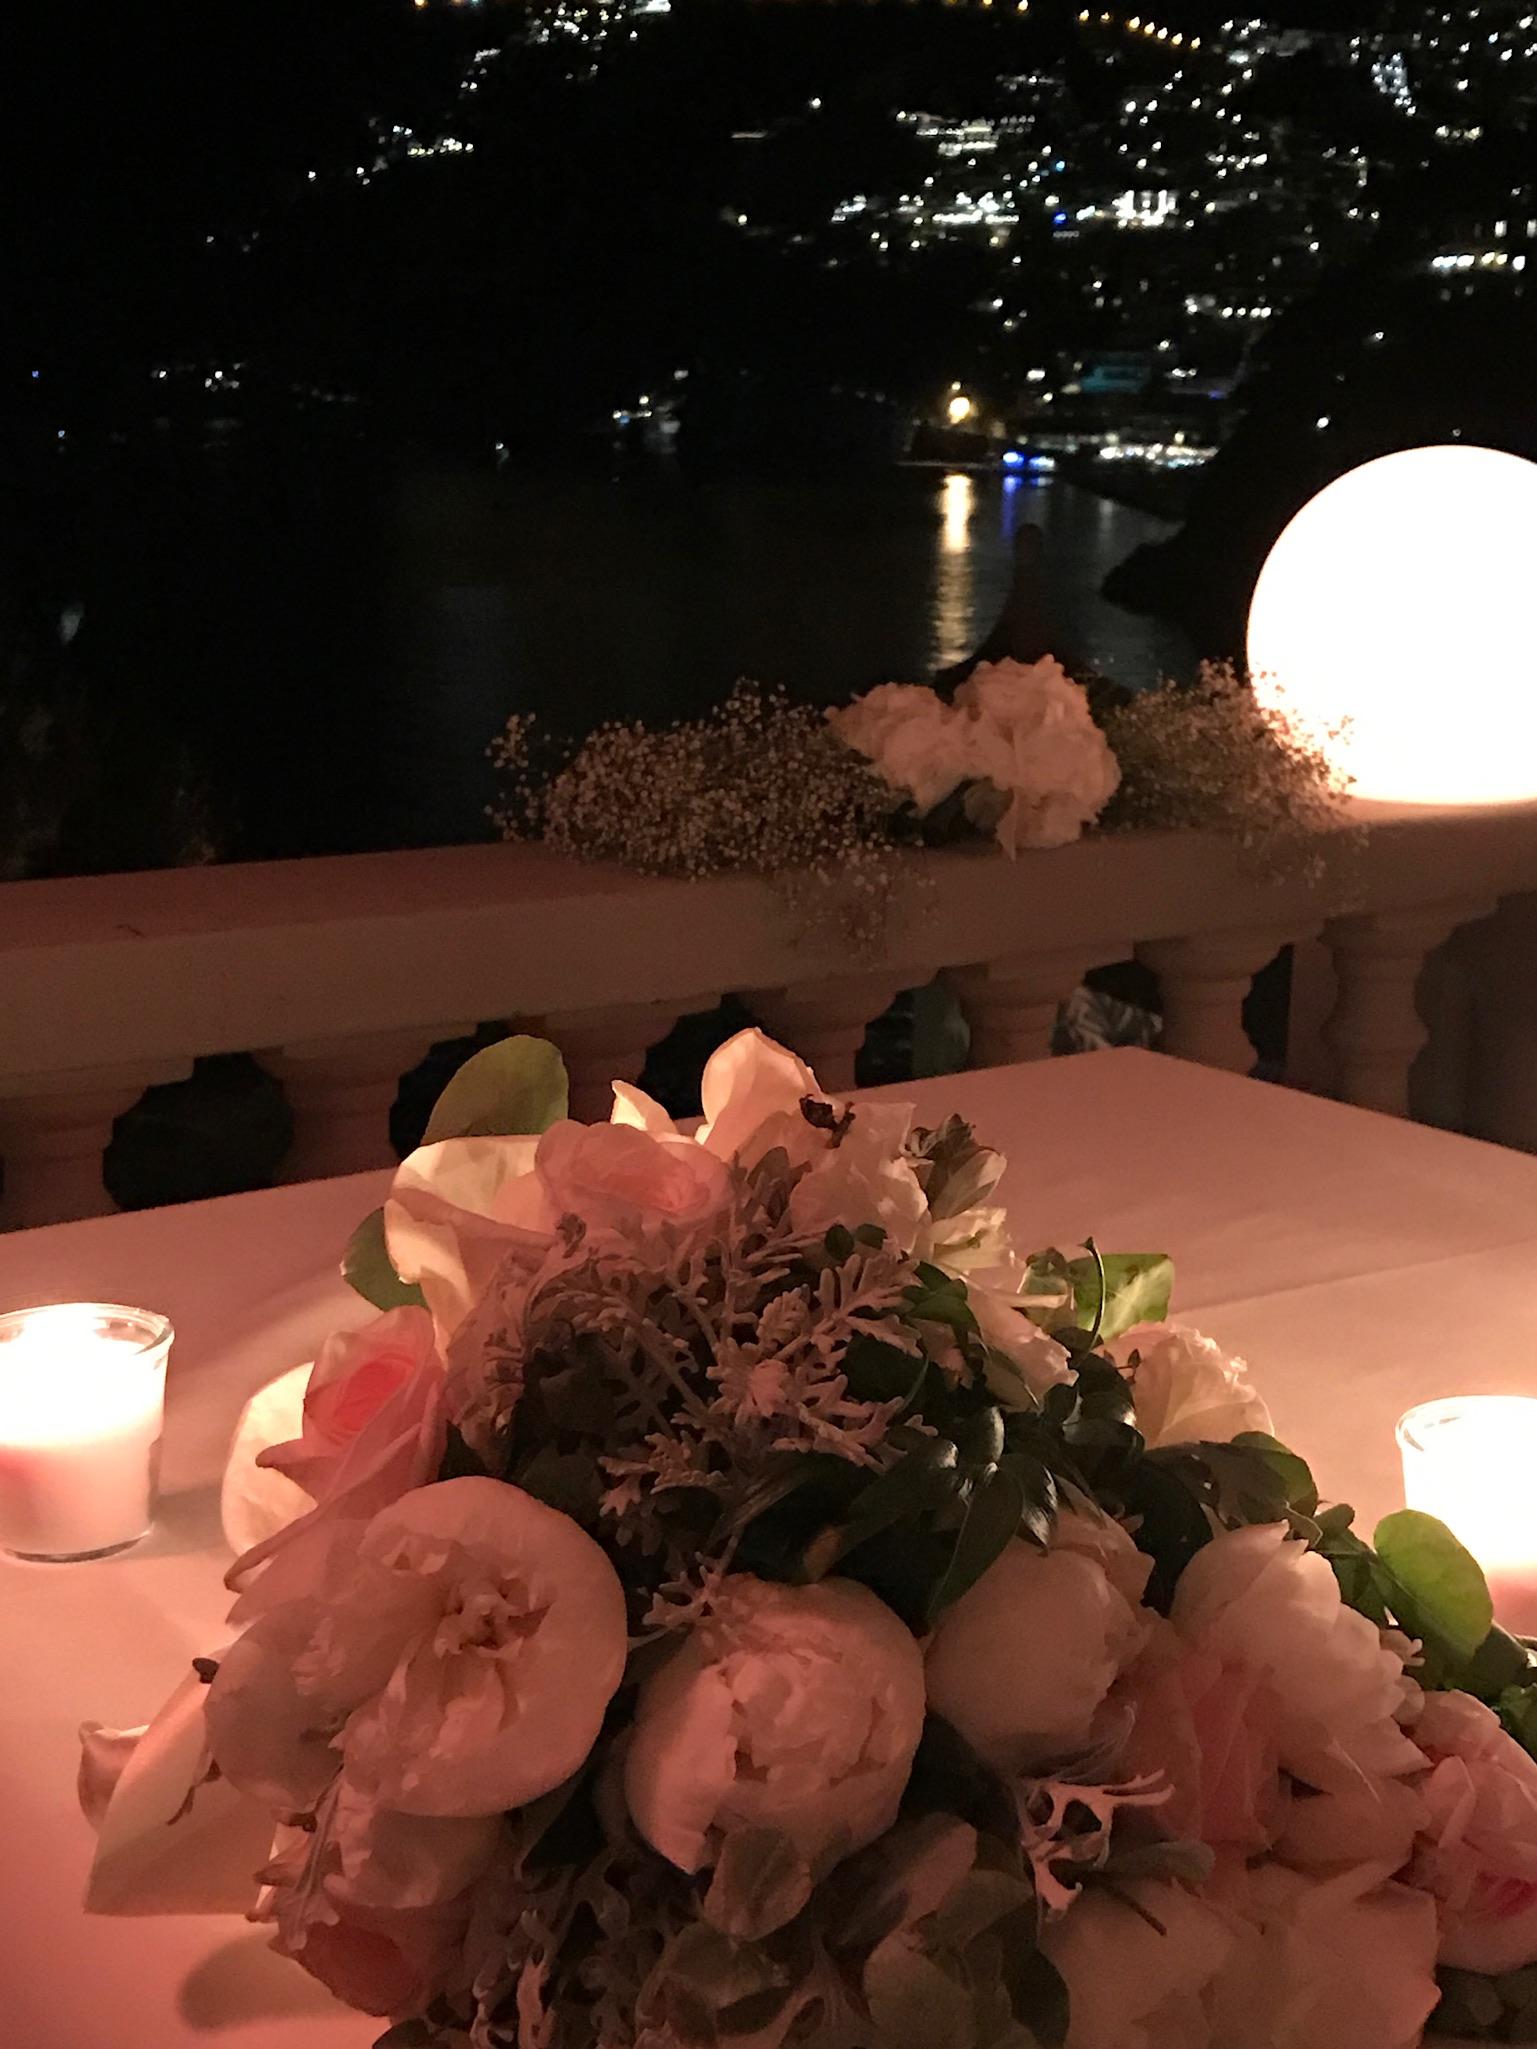 https://www.weddingamalfi.com/wp-content/uploads/Nathalie-and-Benjamin-Wedding-in-Positano-Italy-15.jpg